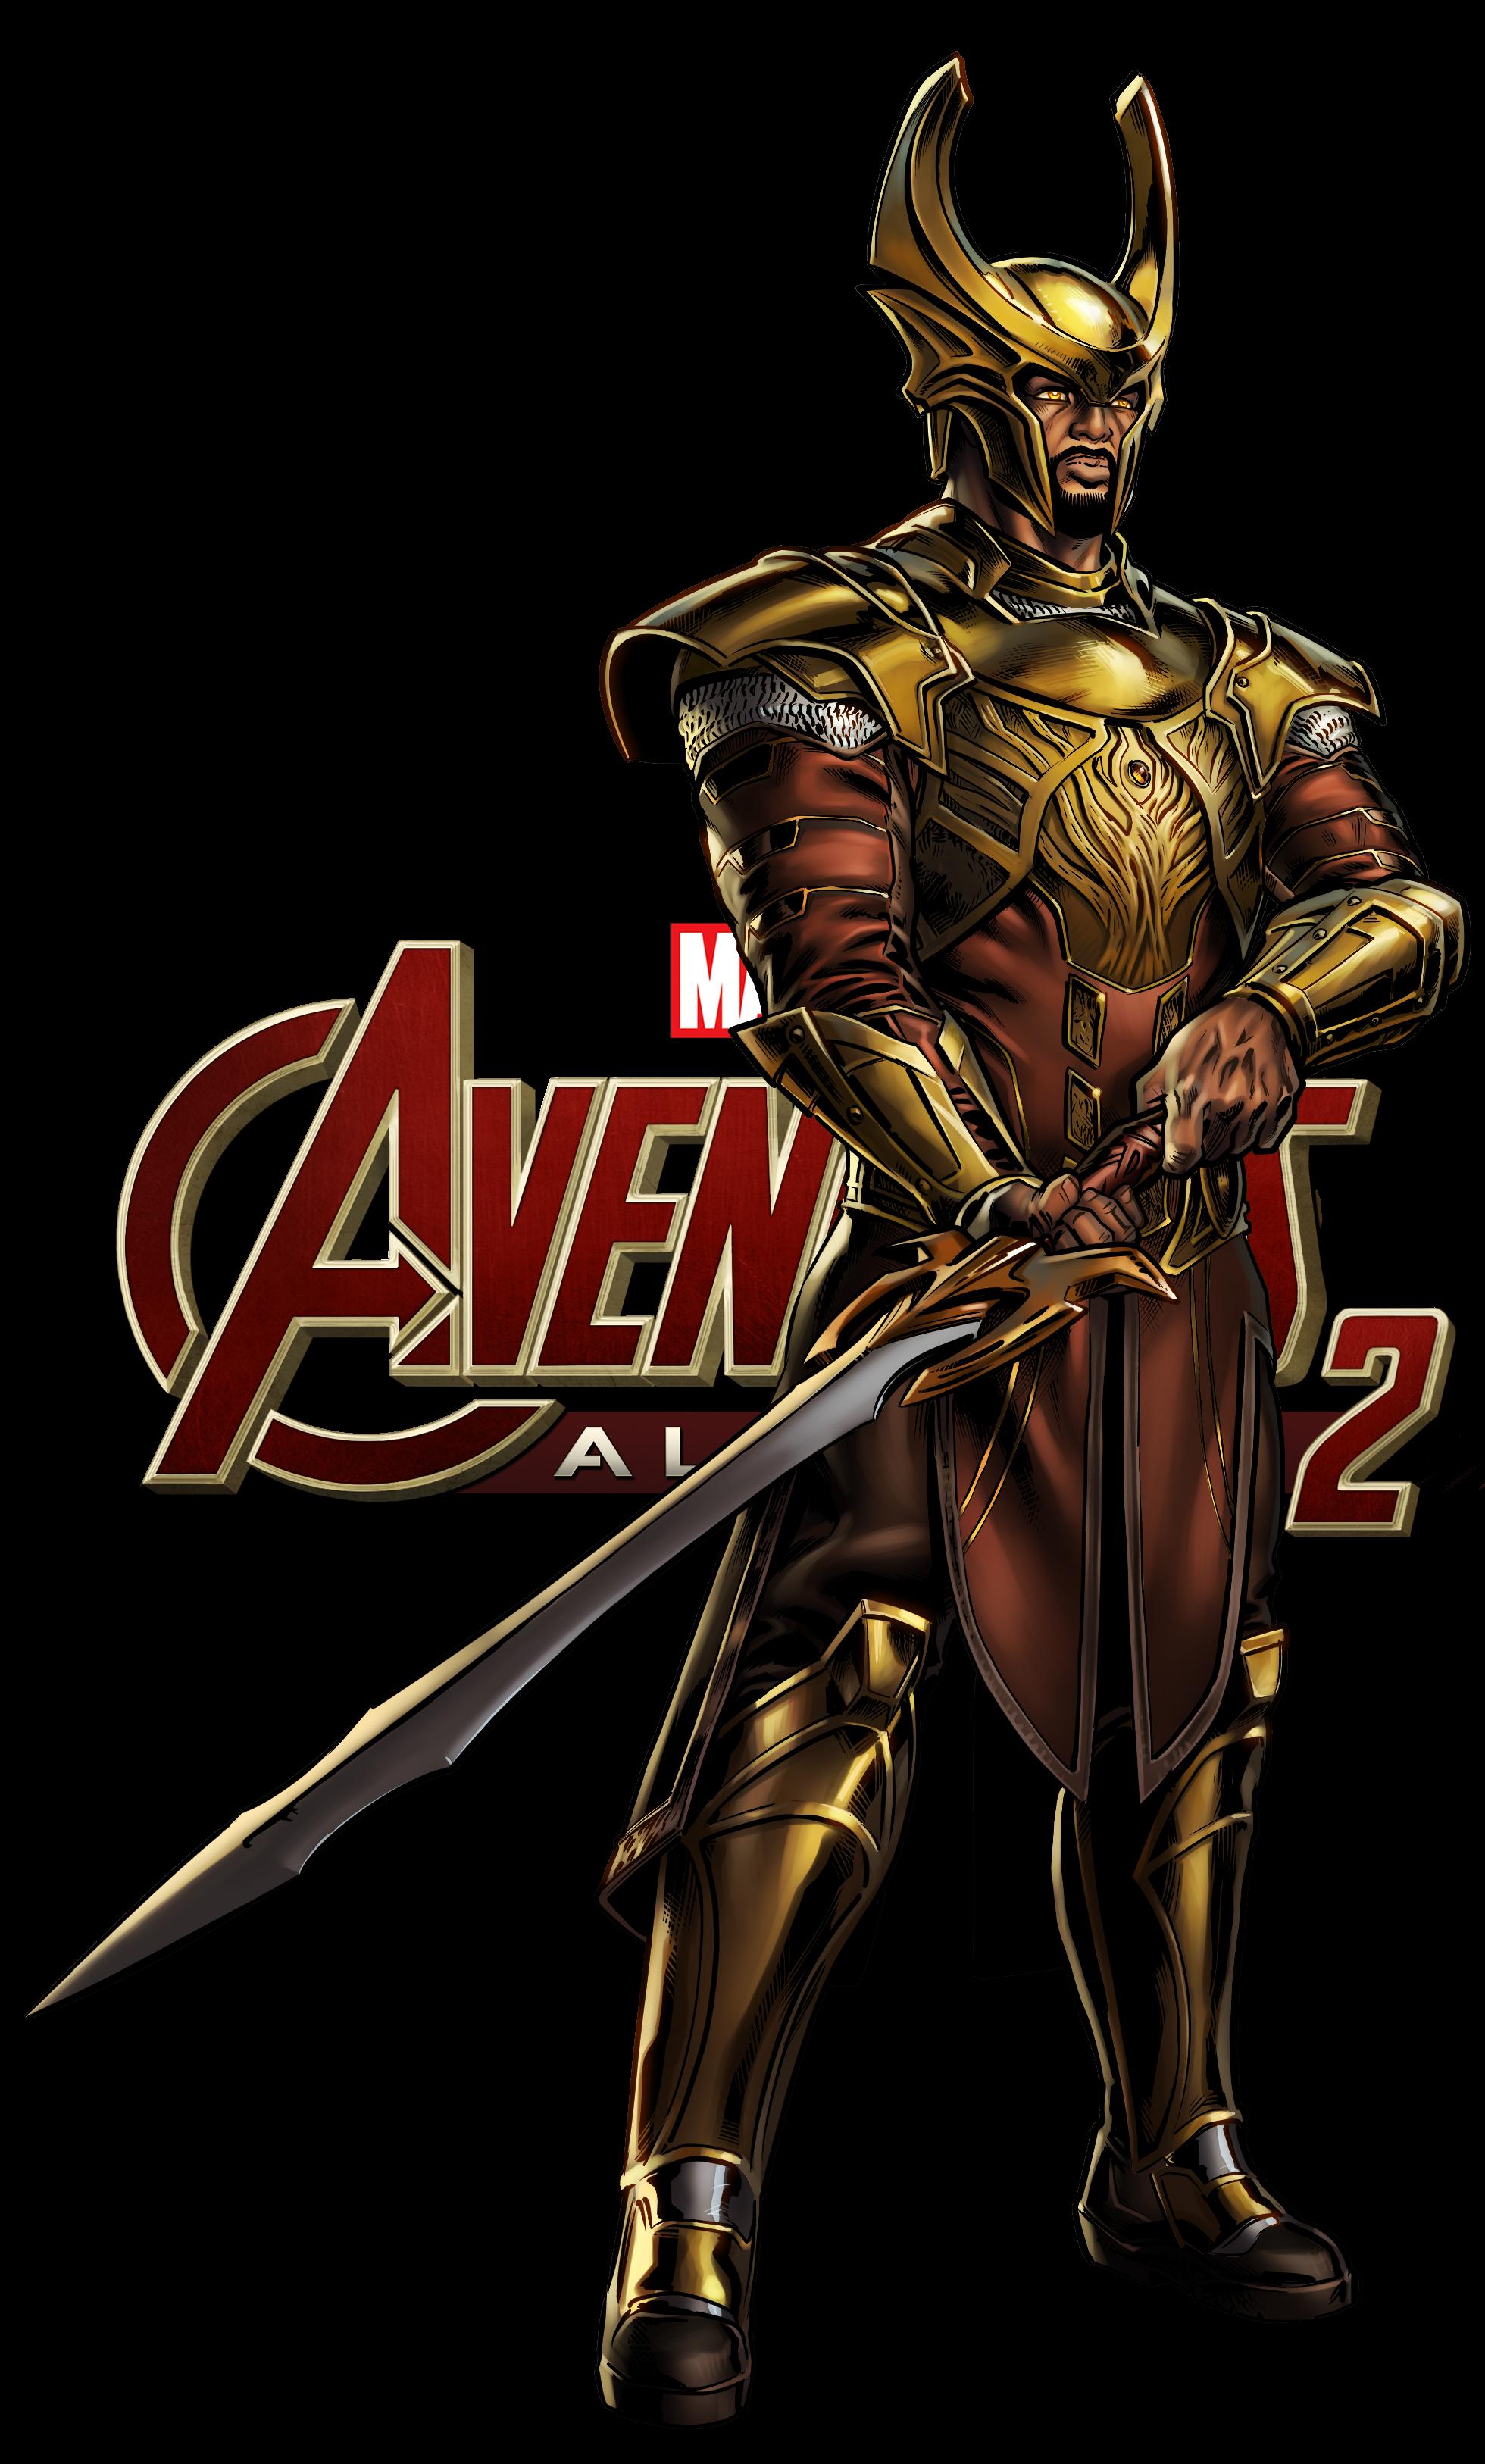 image icon heimdall png marvel avengers alliance 2